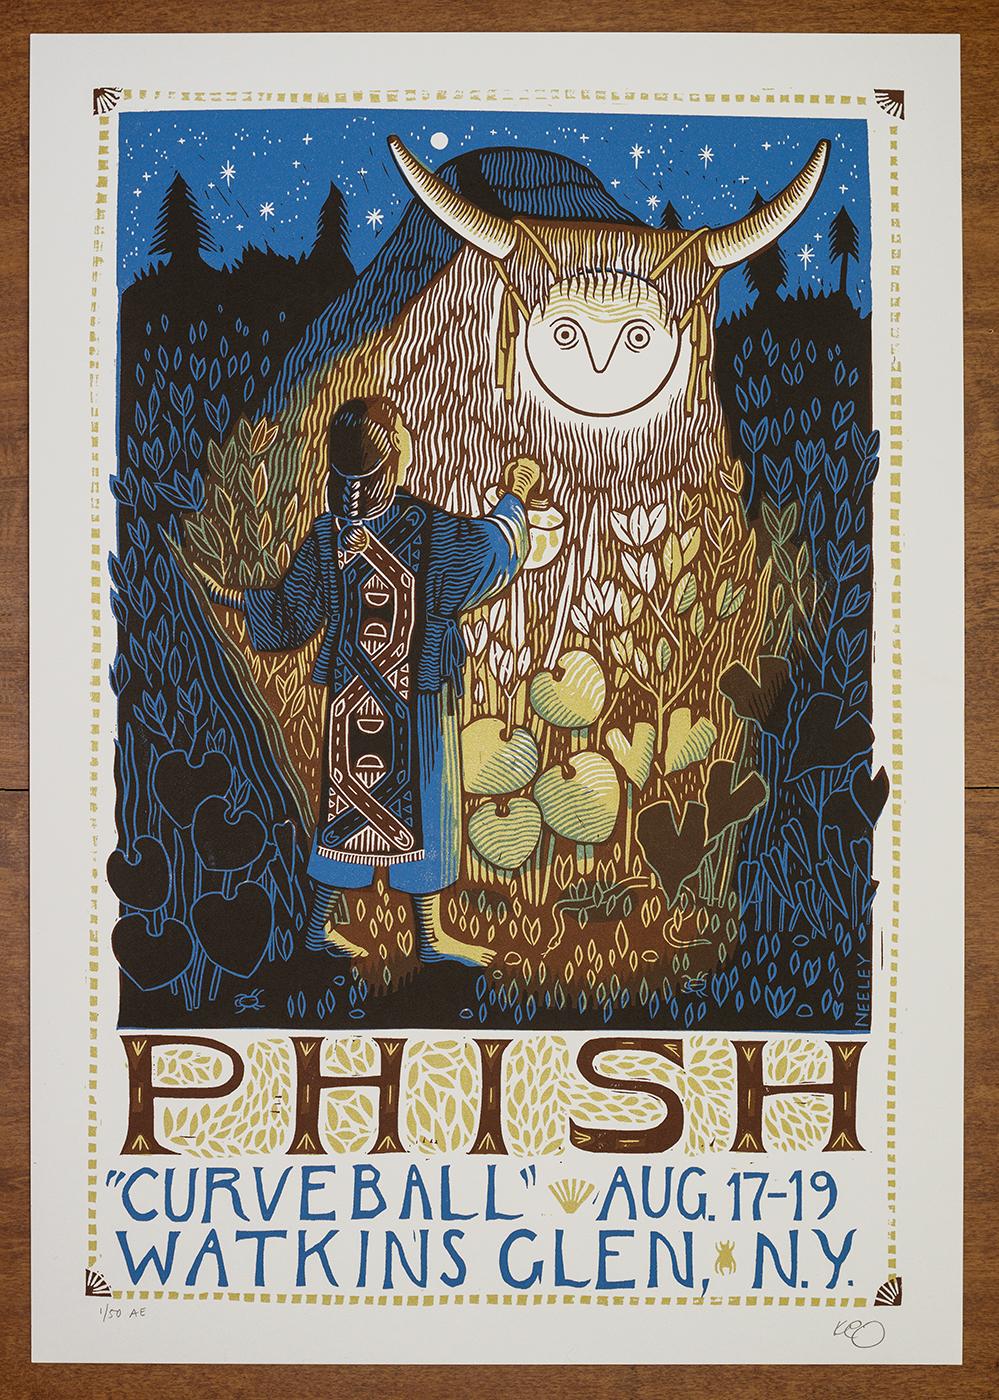 phish poster web.jpg